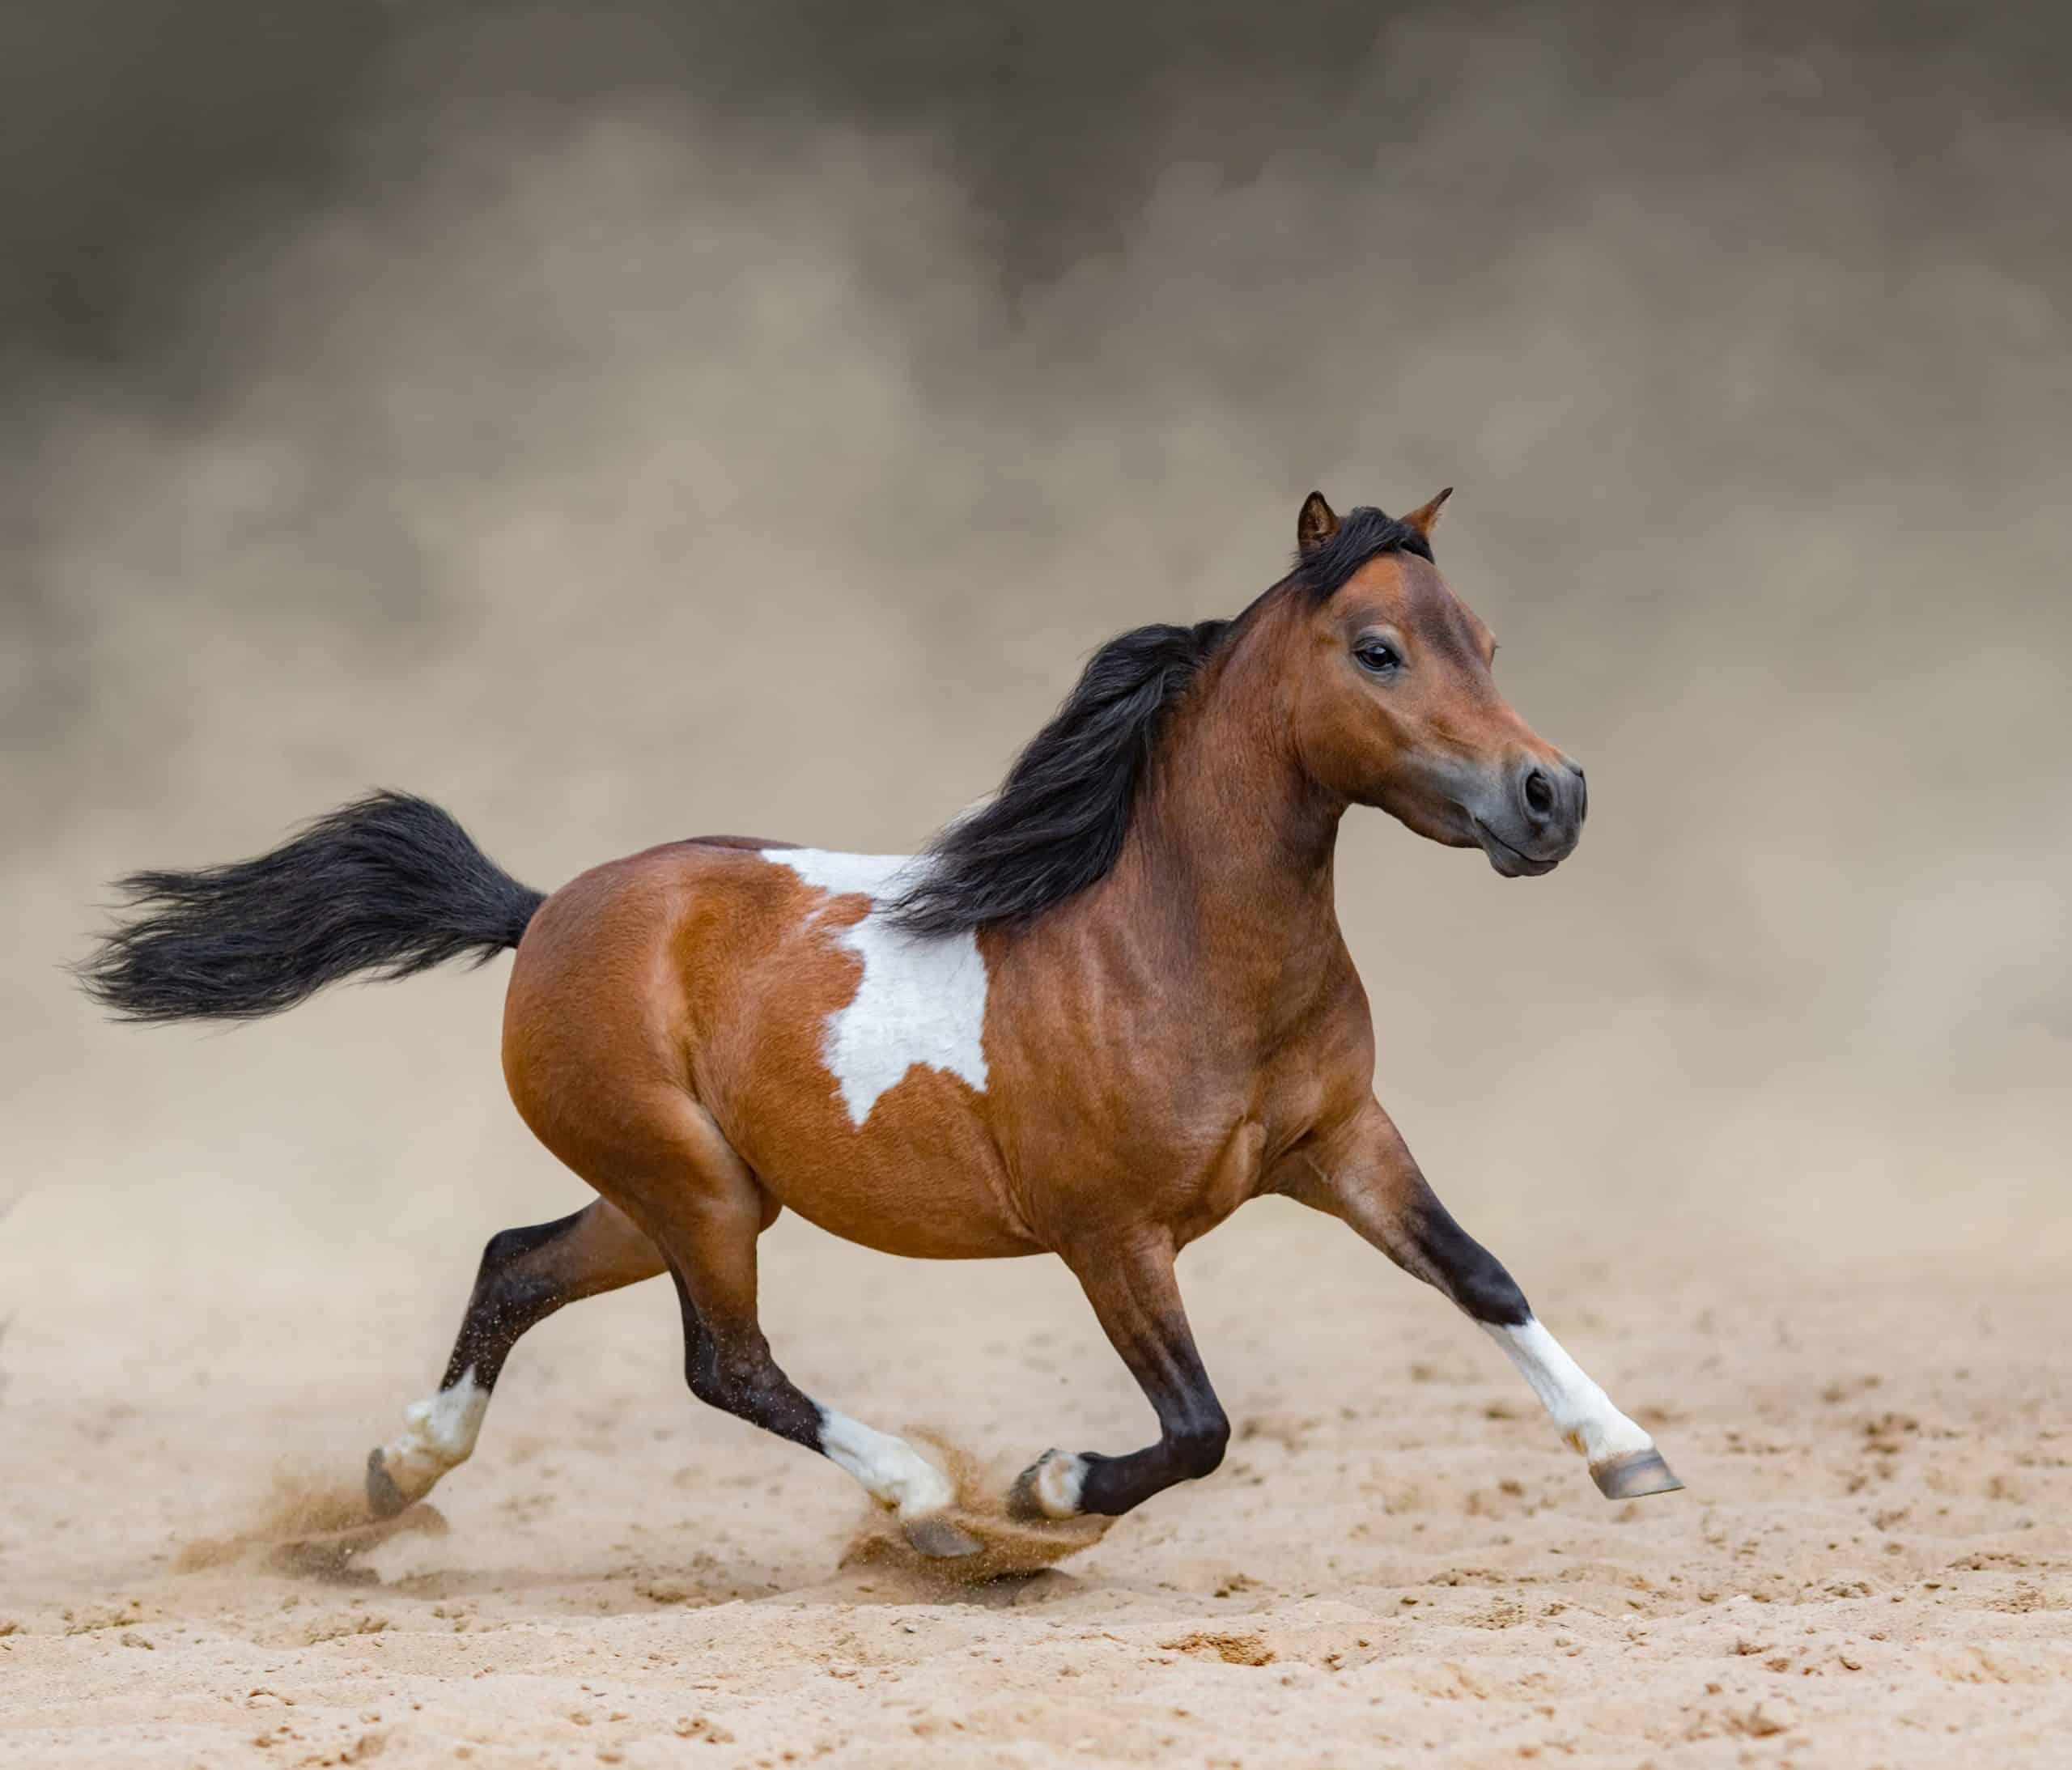 miniature horse race unusual sports